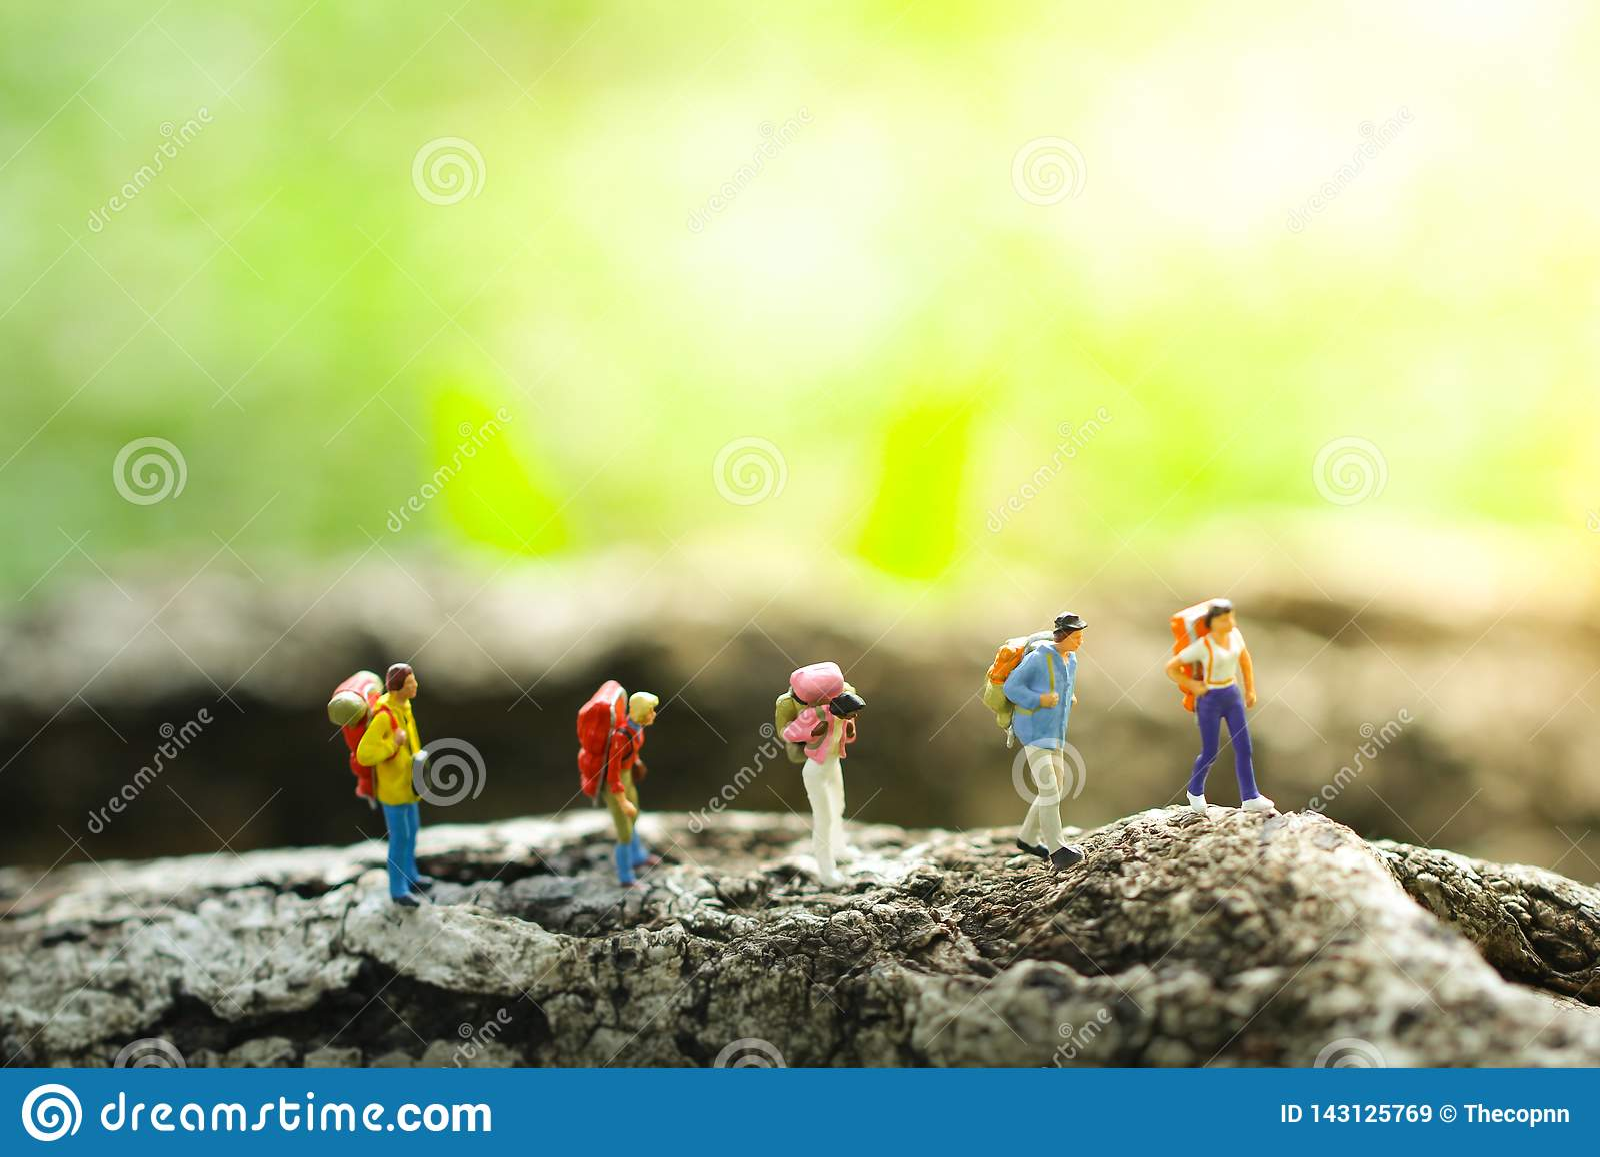 Senderismo de cinco viajeros en selva en fondo borroso verdor